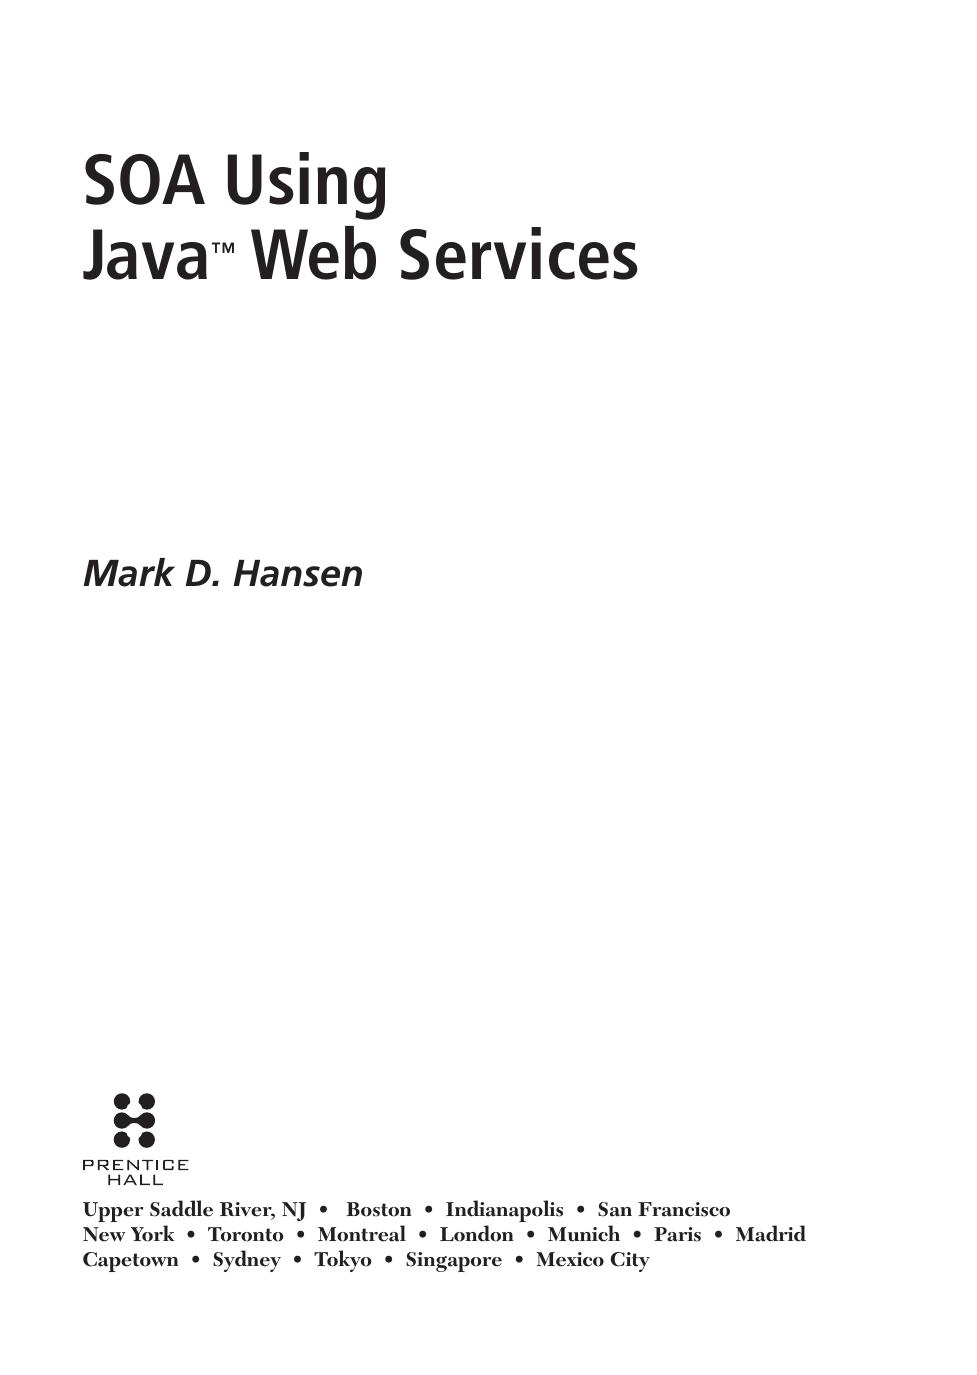 SOA Using Java™ Web Services - X | manualzz com